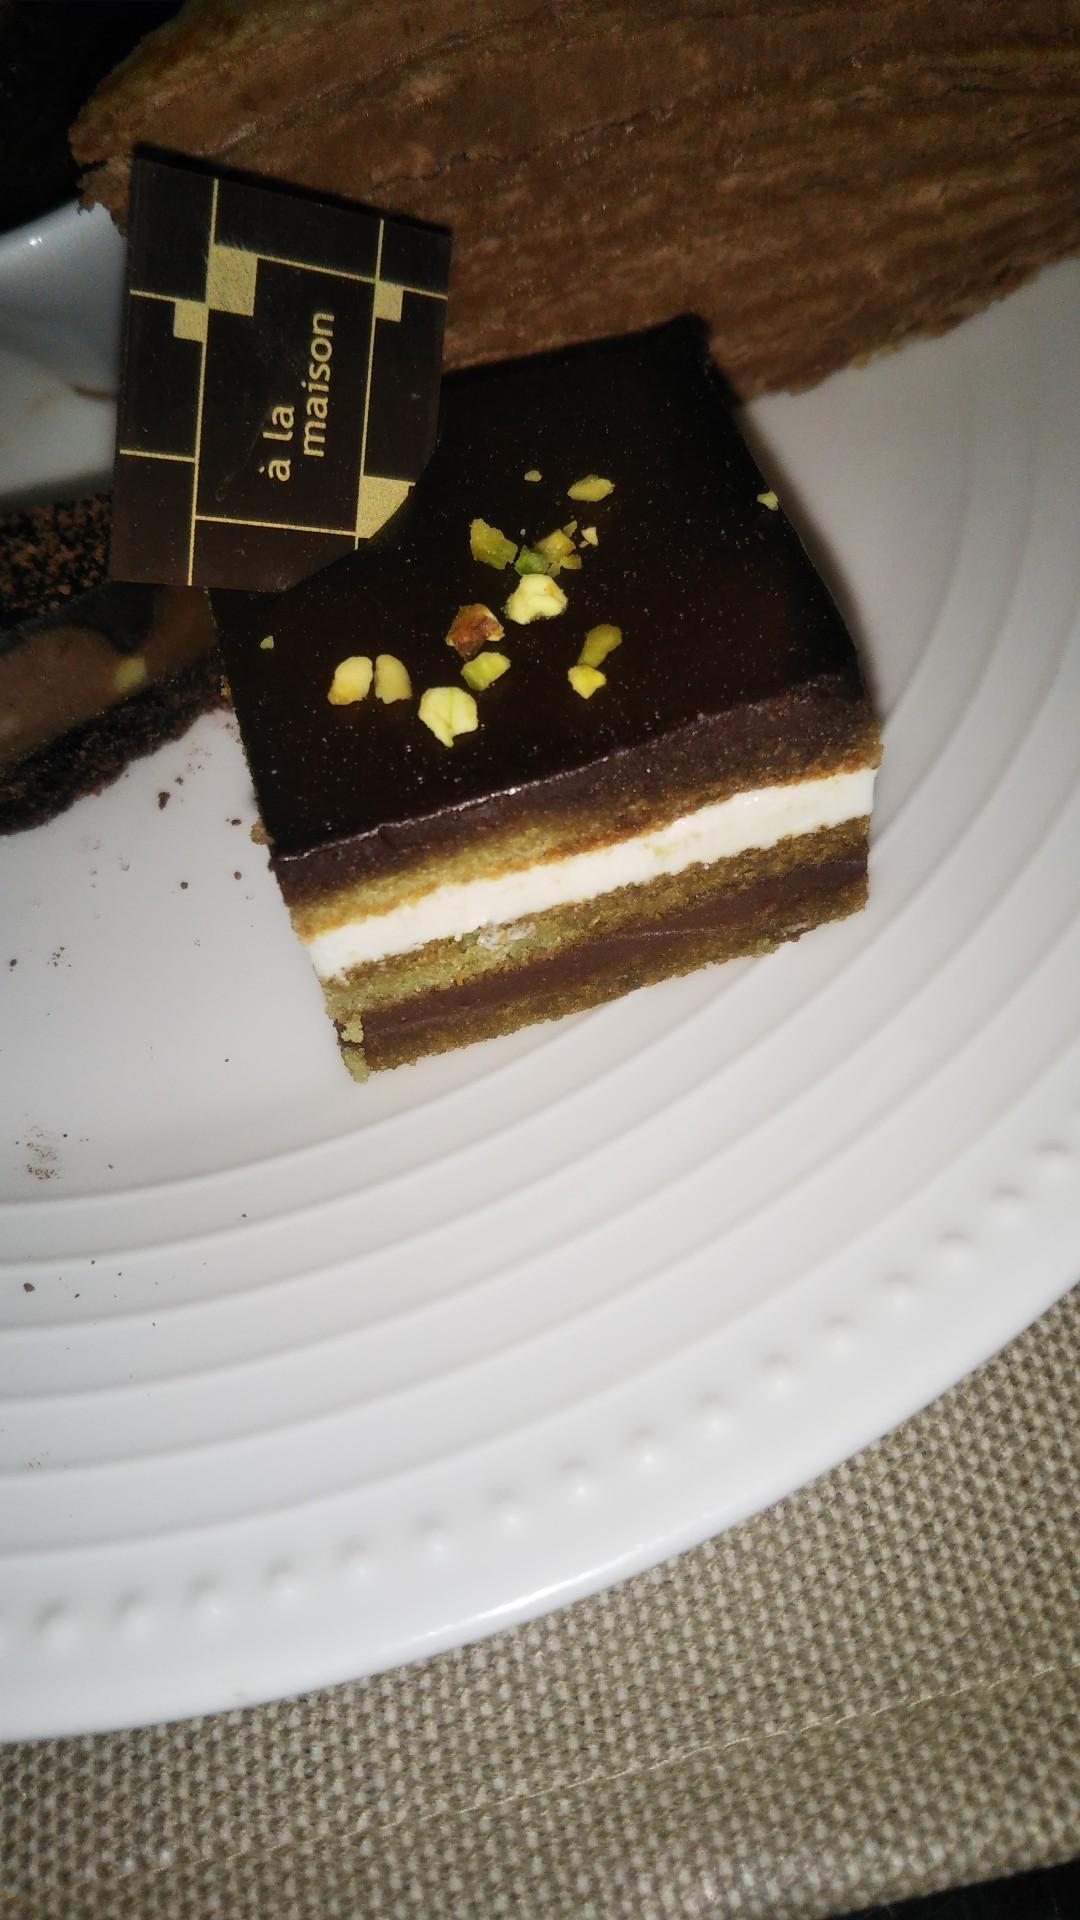 ANAインターコンチネンタルホテル東京 シャンパン・バー チョコレート・スイーツブッフェ_f0076001_22053518.jpg